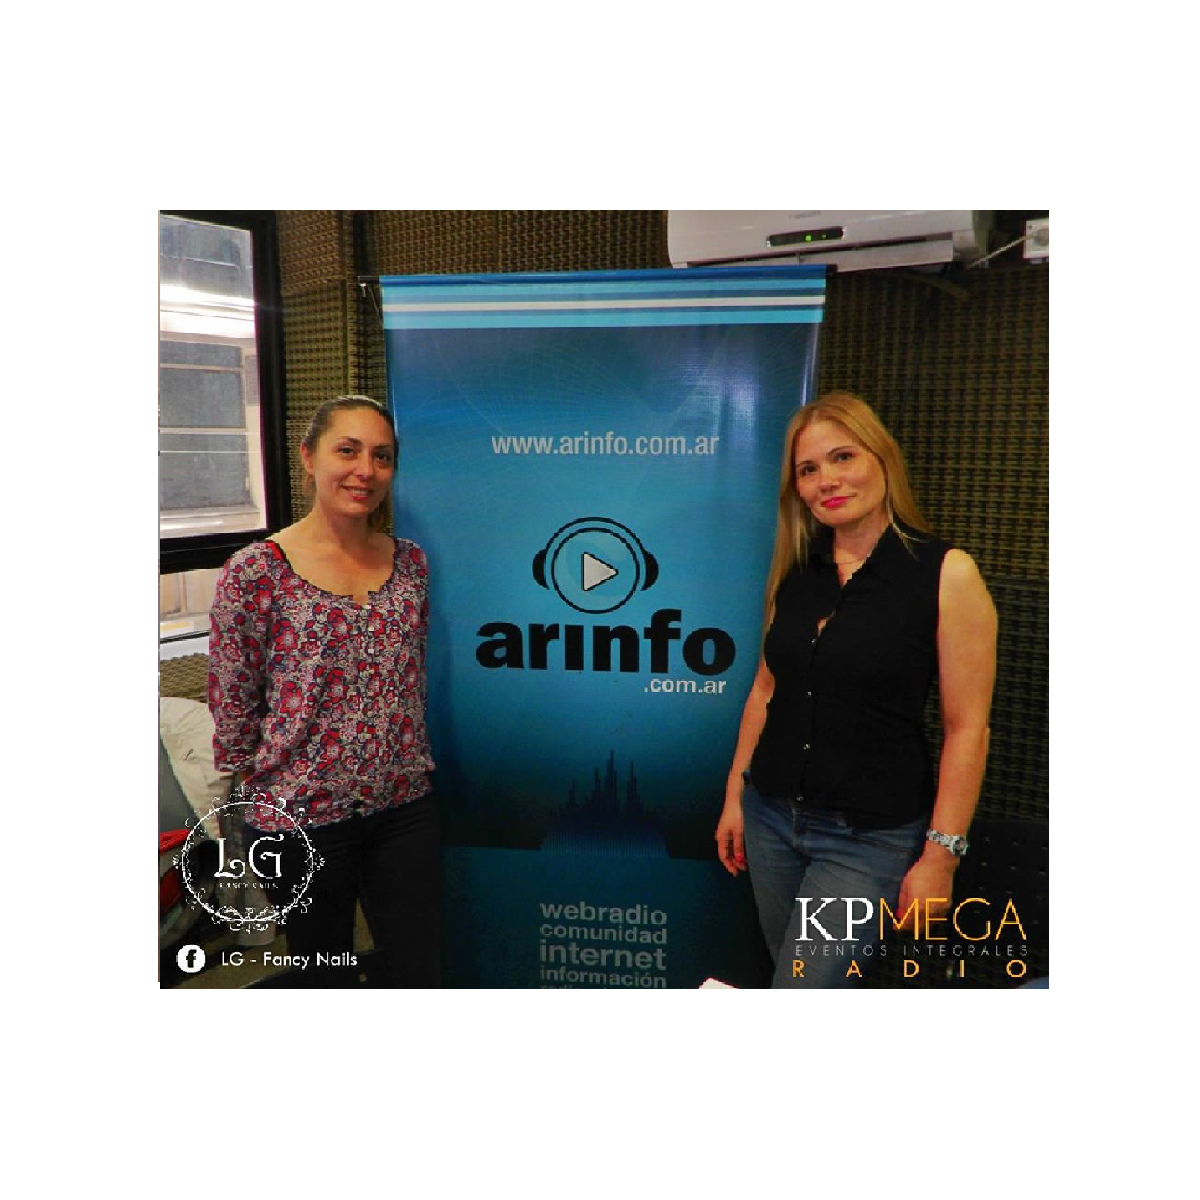 PRODUCTORA DE MODA KP MEGA PRODUCCIONES PERIODISTA KARINA PACHECO AUDIO VISUAL ENZO MONTENEGRO